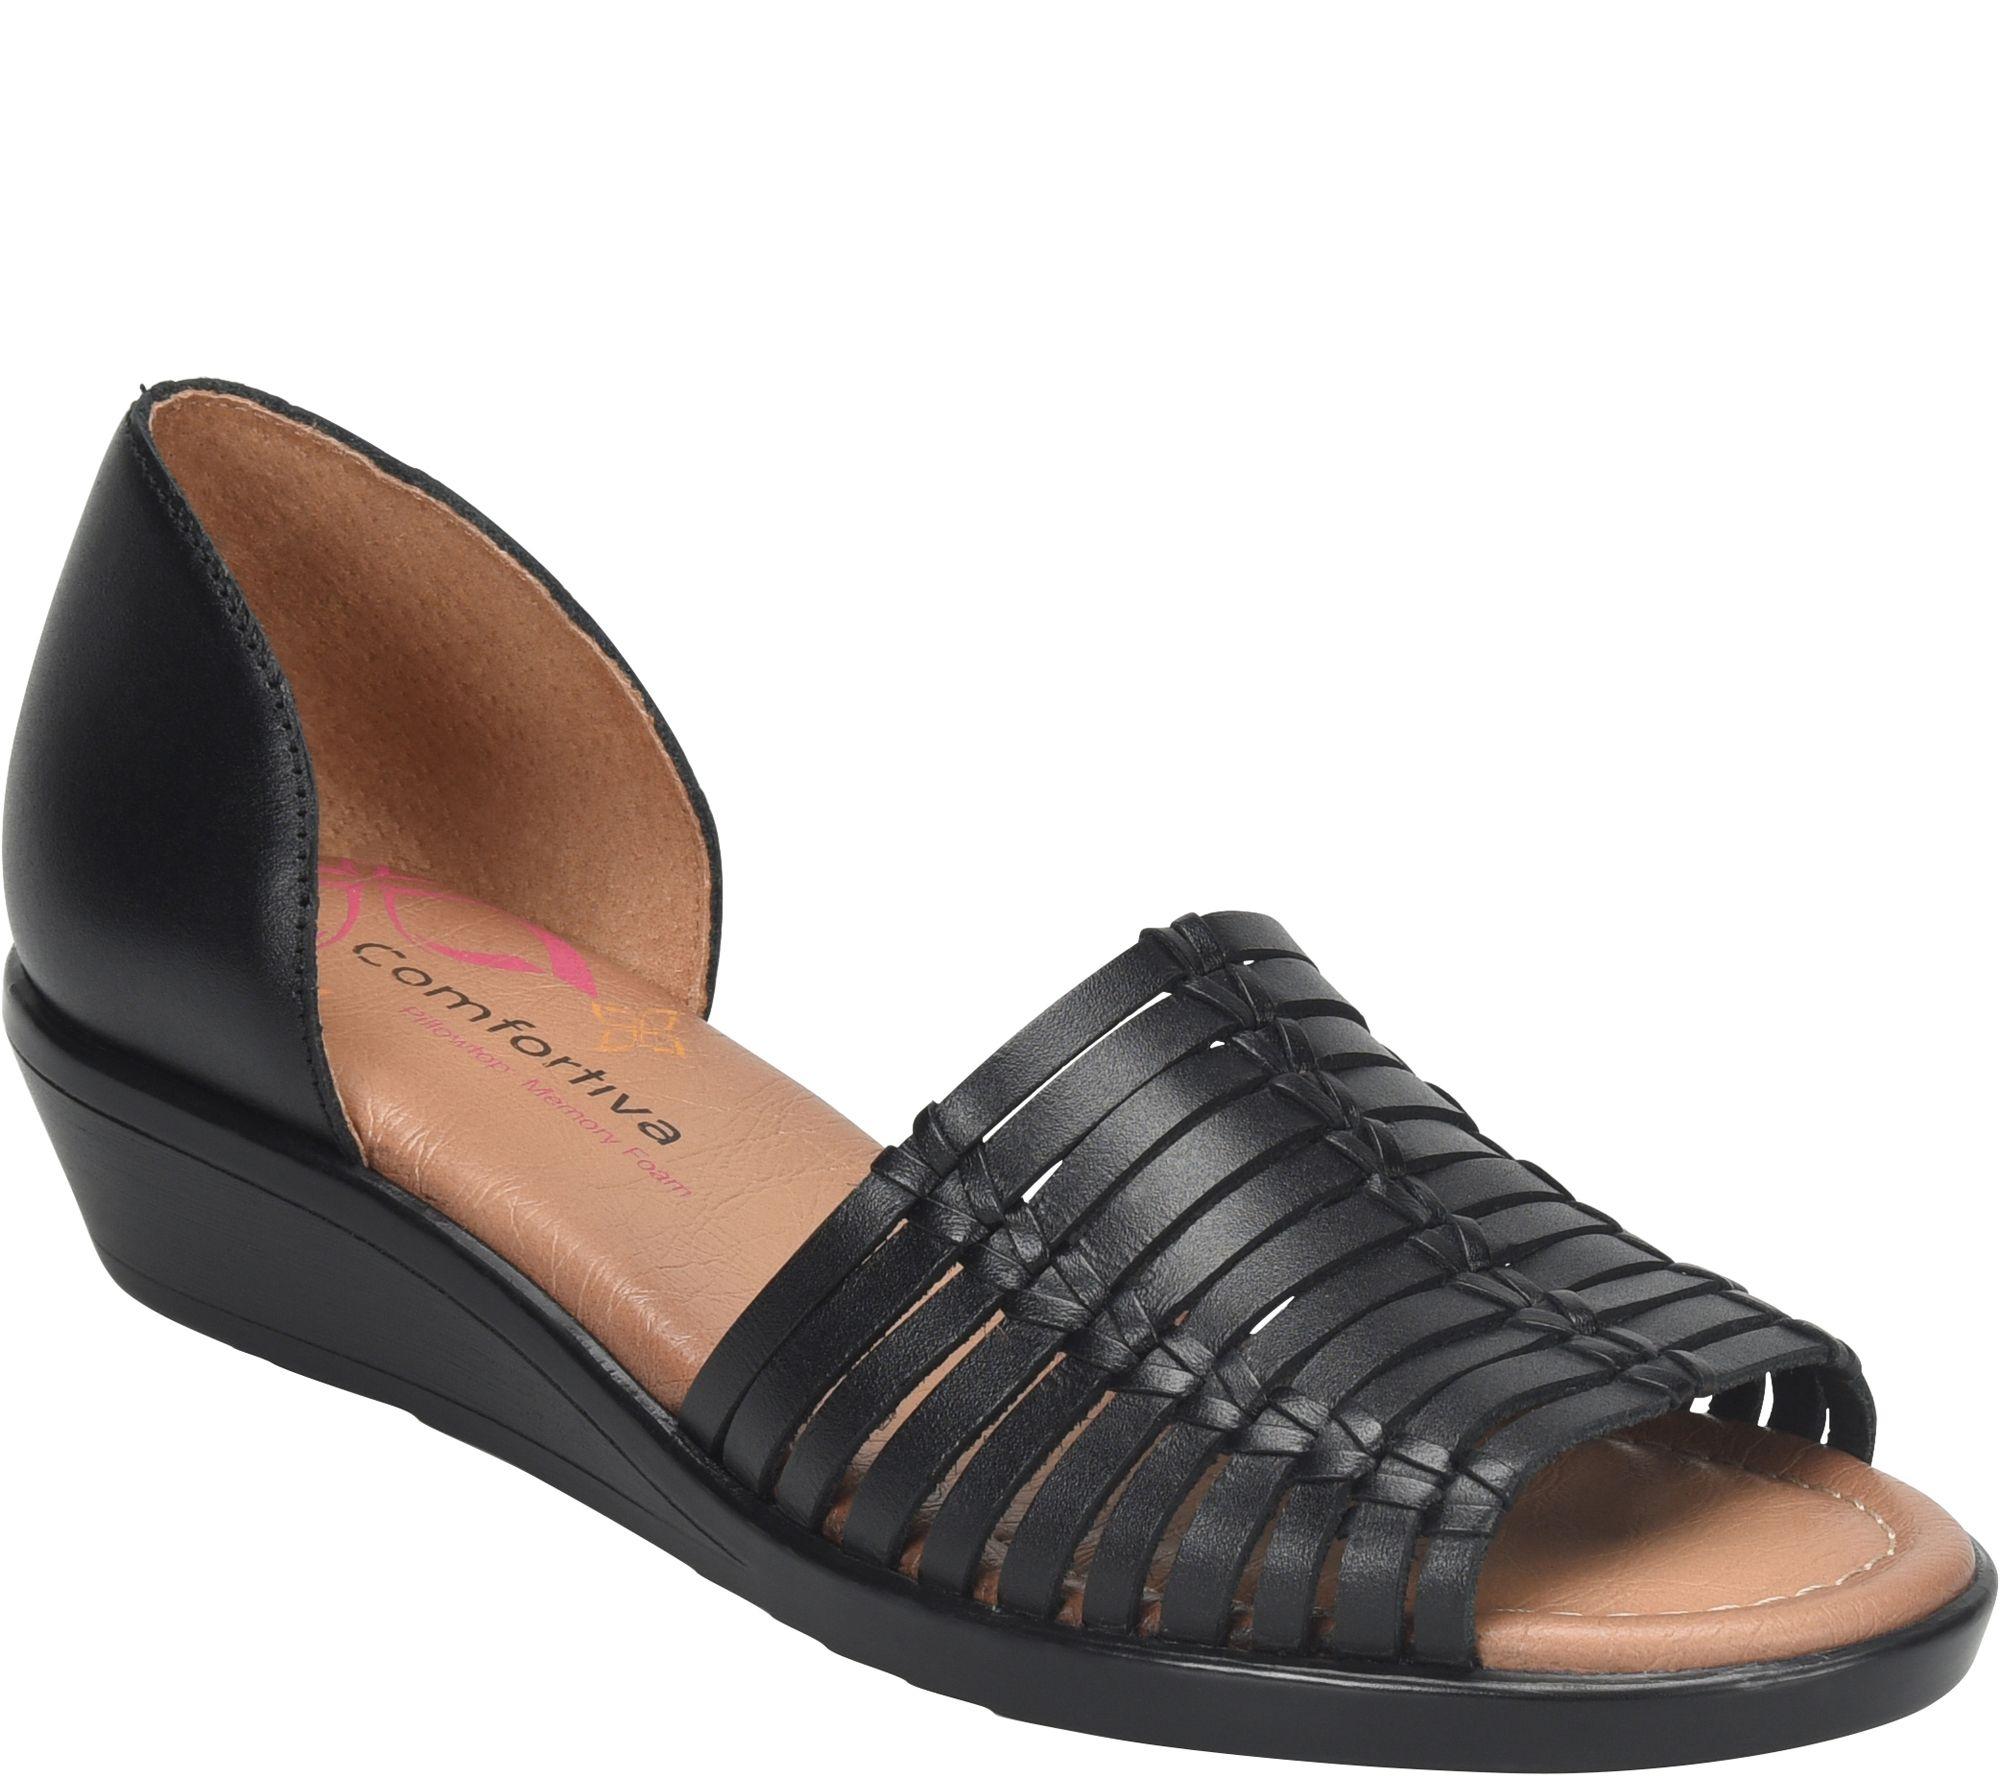 93dd88c087209 Comfortiva Leather Huarache Sandals - Fayann - Page 1 — QVC.com